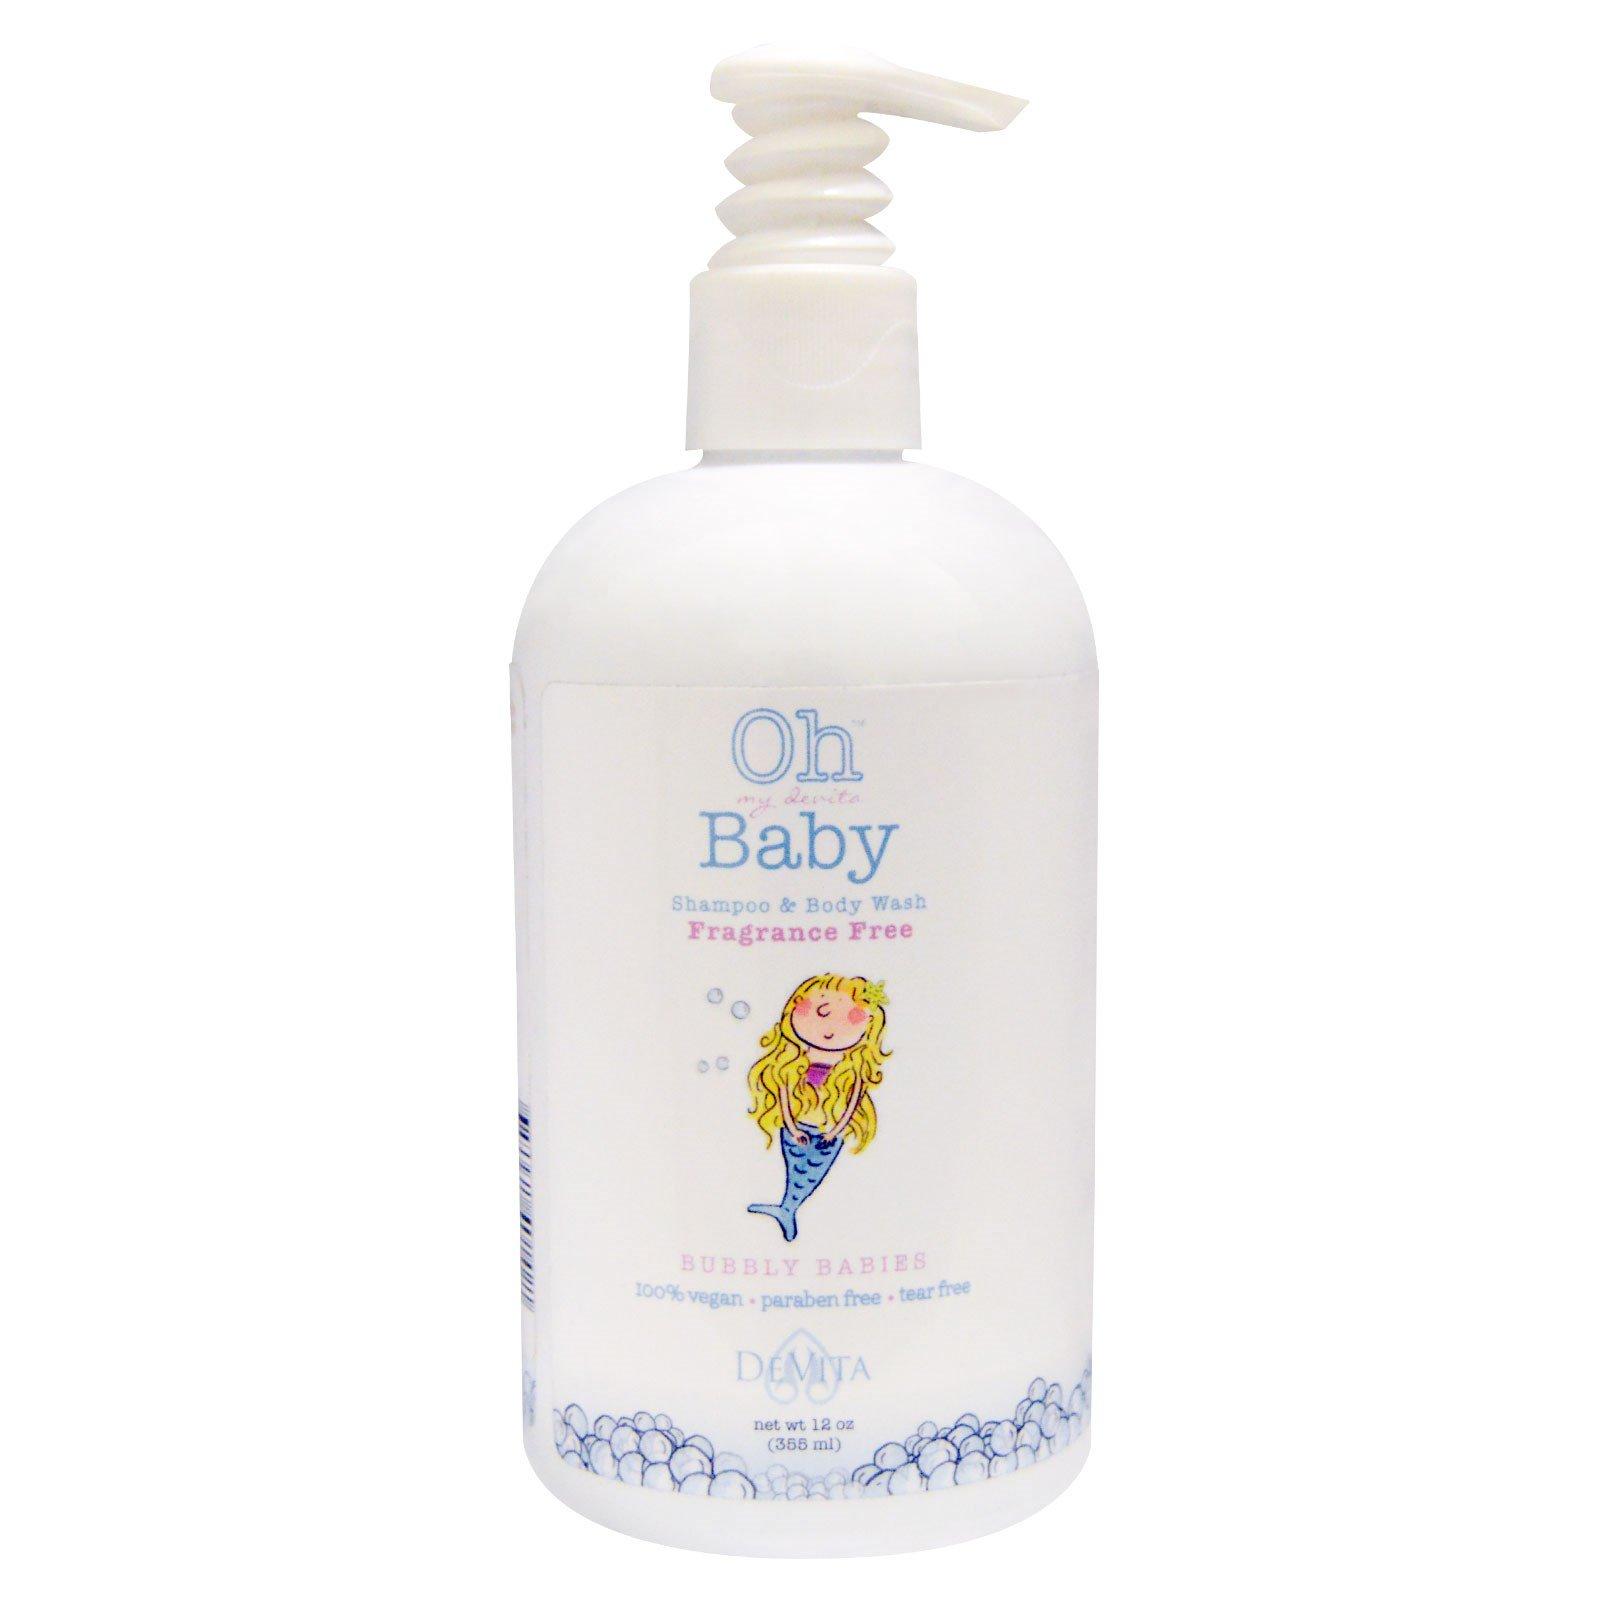 DeVita, Oh My Devita Baby, шампунь для волос и тела, Bubbly babies, без отдушек, 12 жидких унций (355 мл)